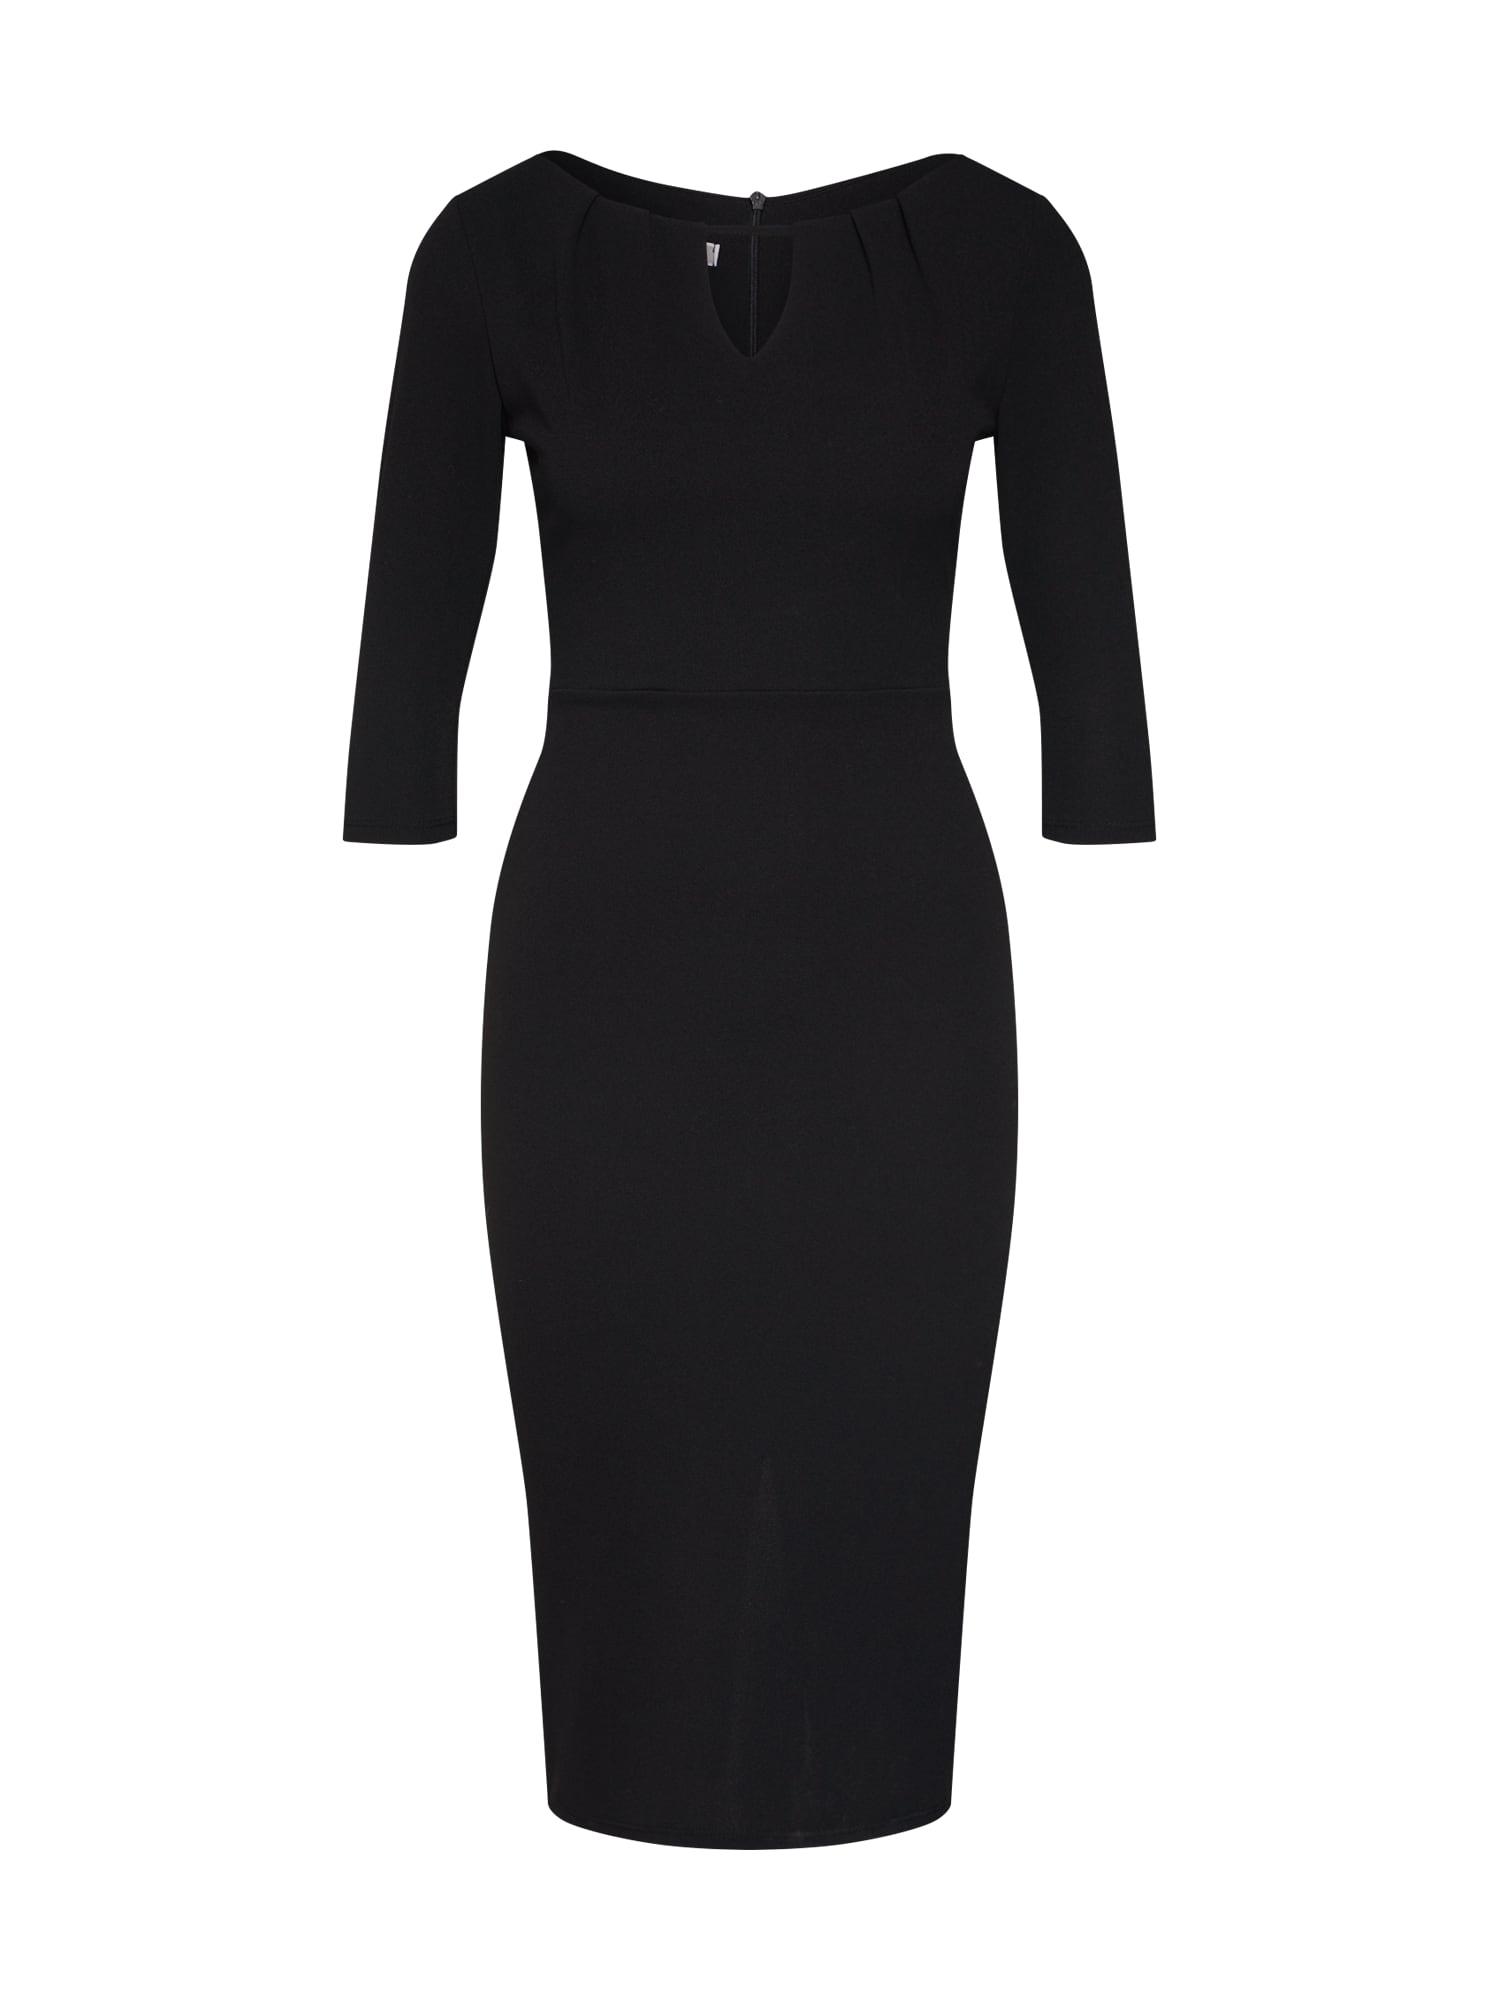 Pouzdrové šaty WG 7865 černá WAL G.